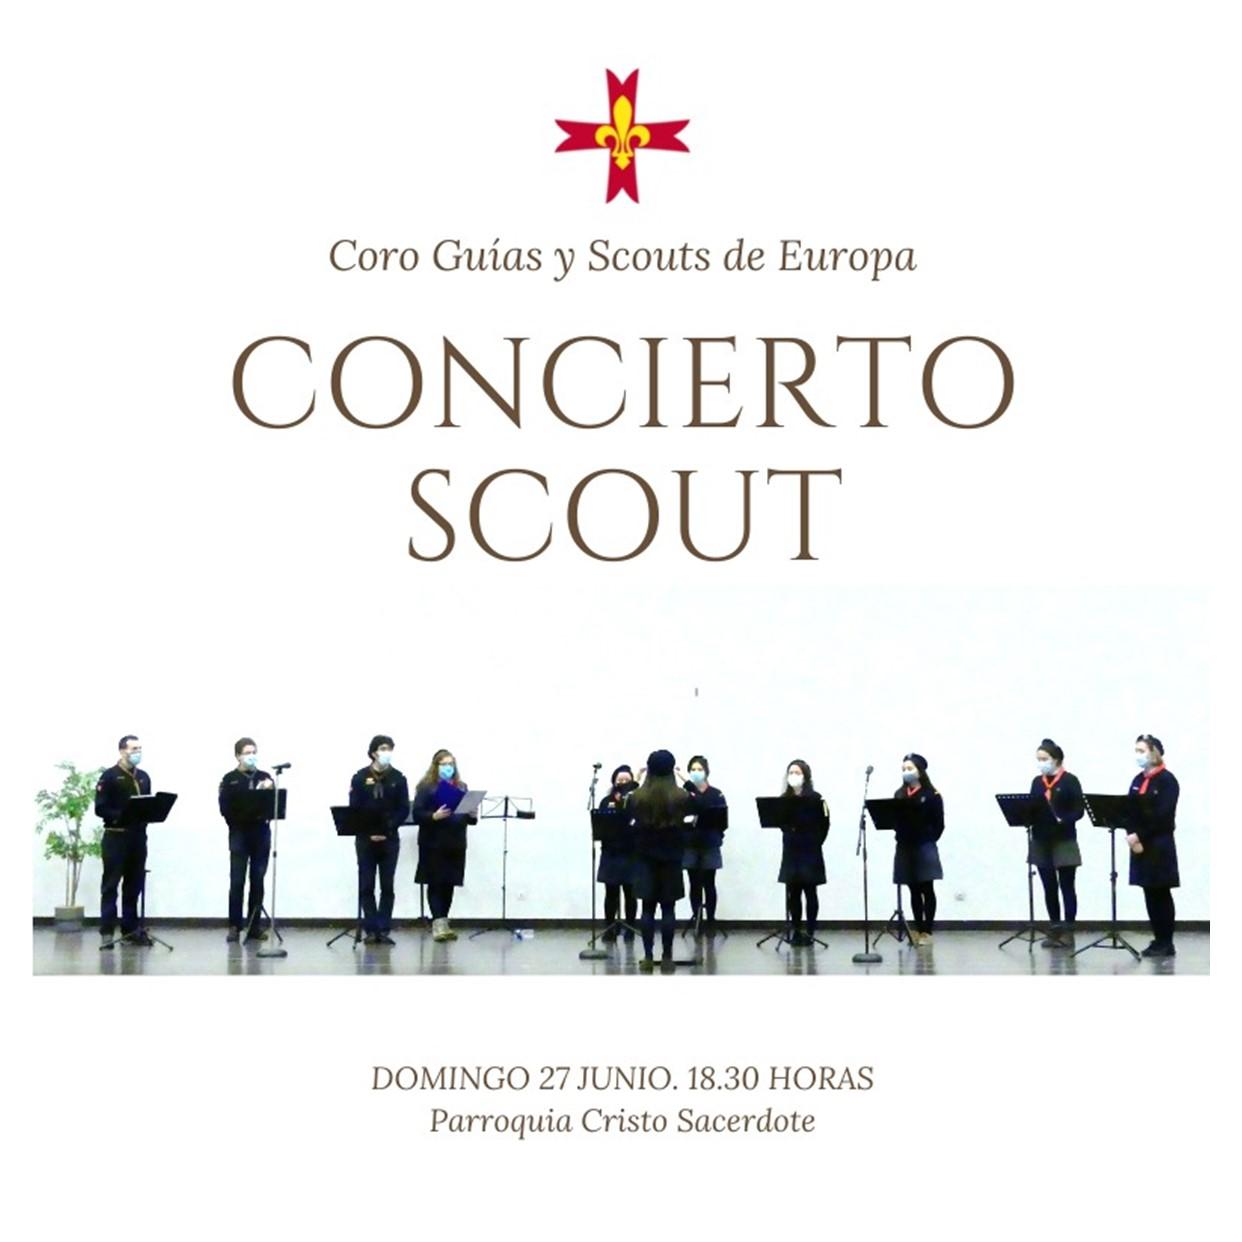 Concierto Scout en la parroquia